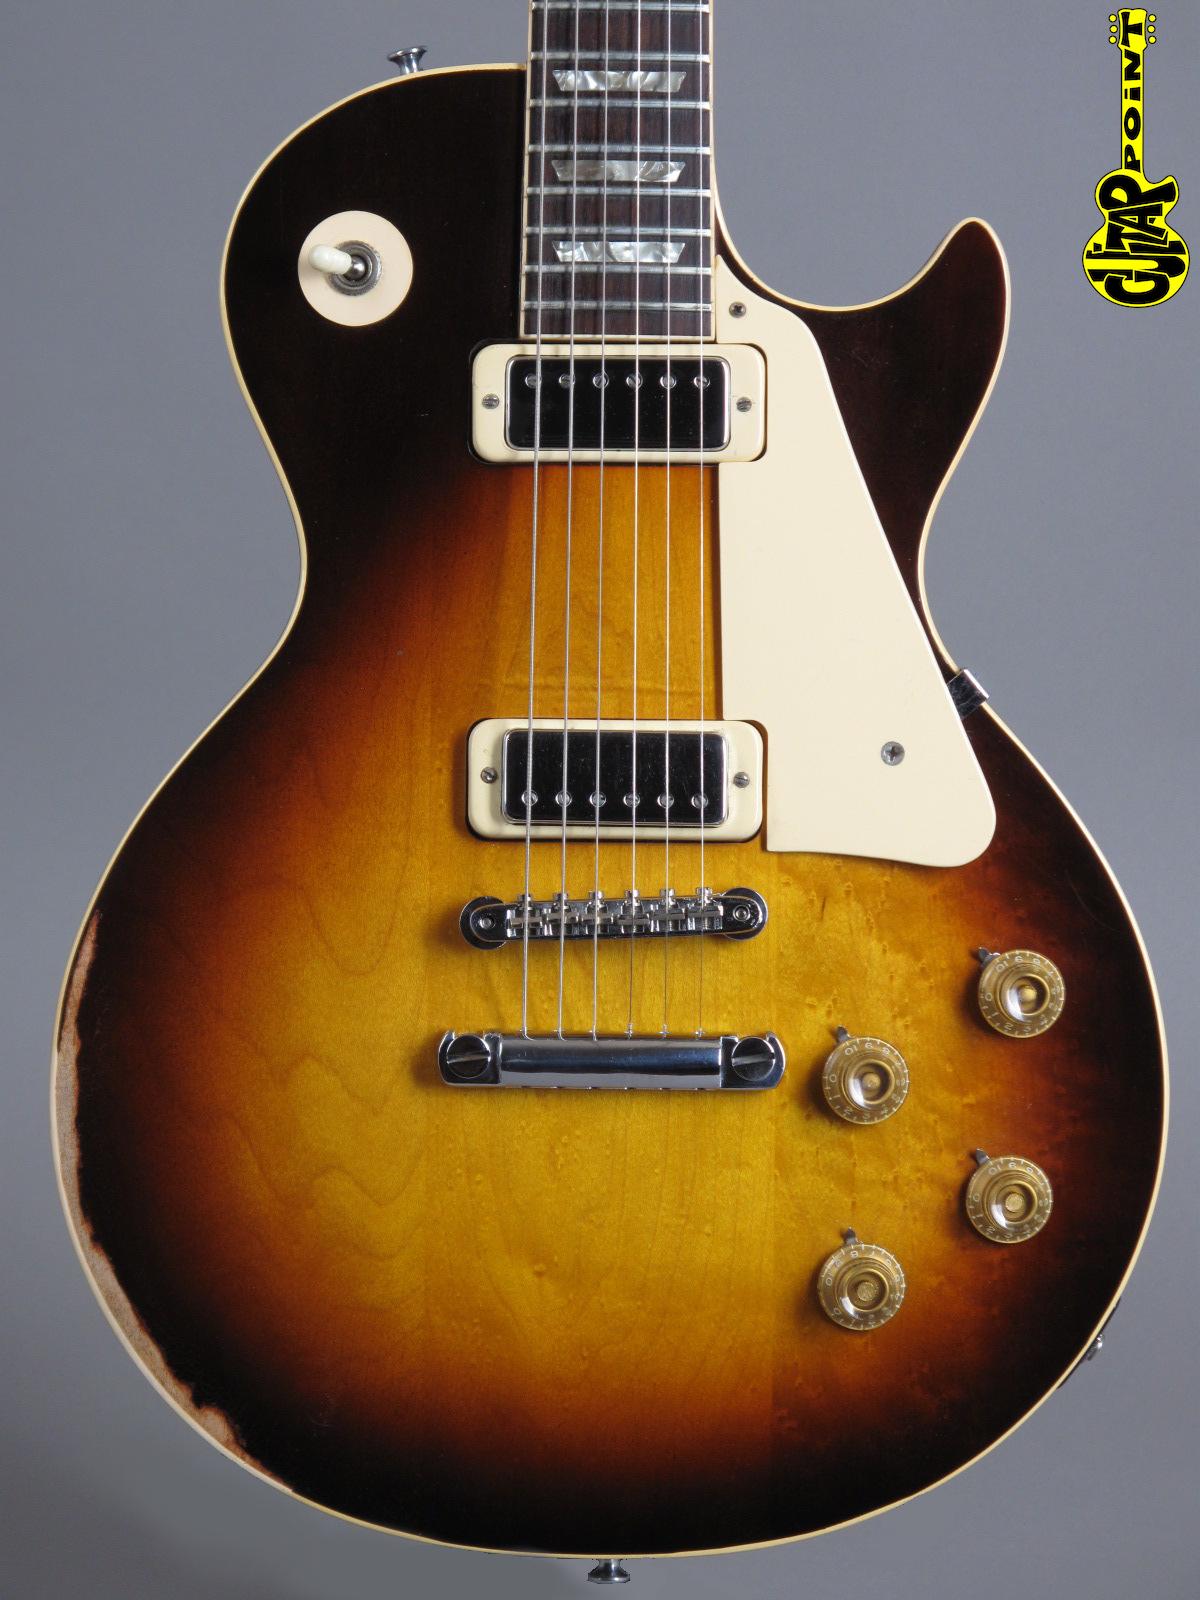 1973 Gibson Les Paul Deluxe - TobaccoSunburst